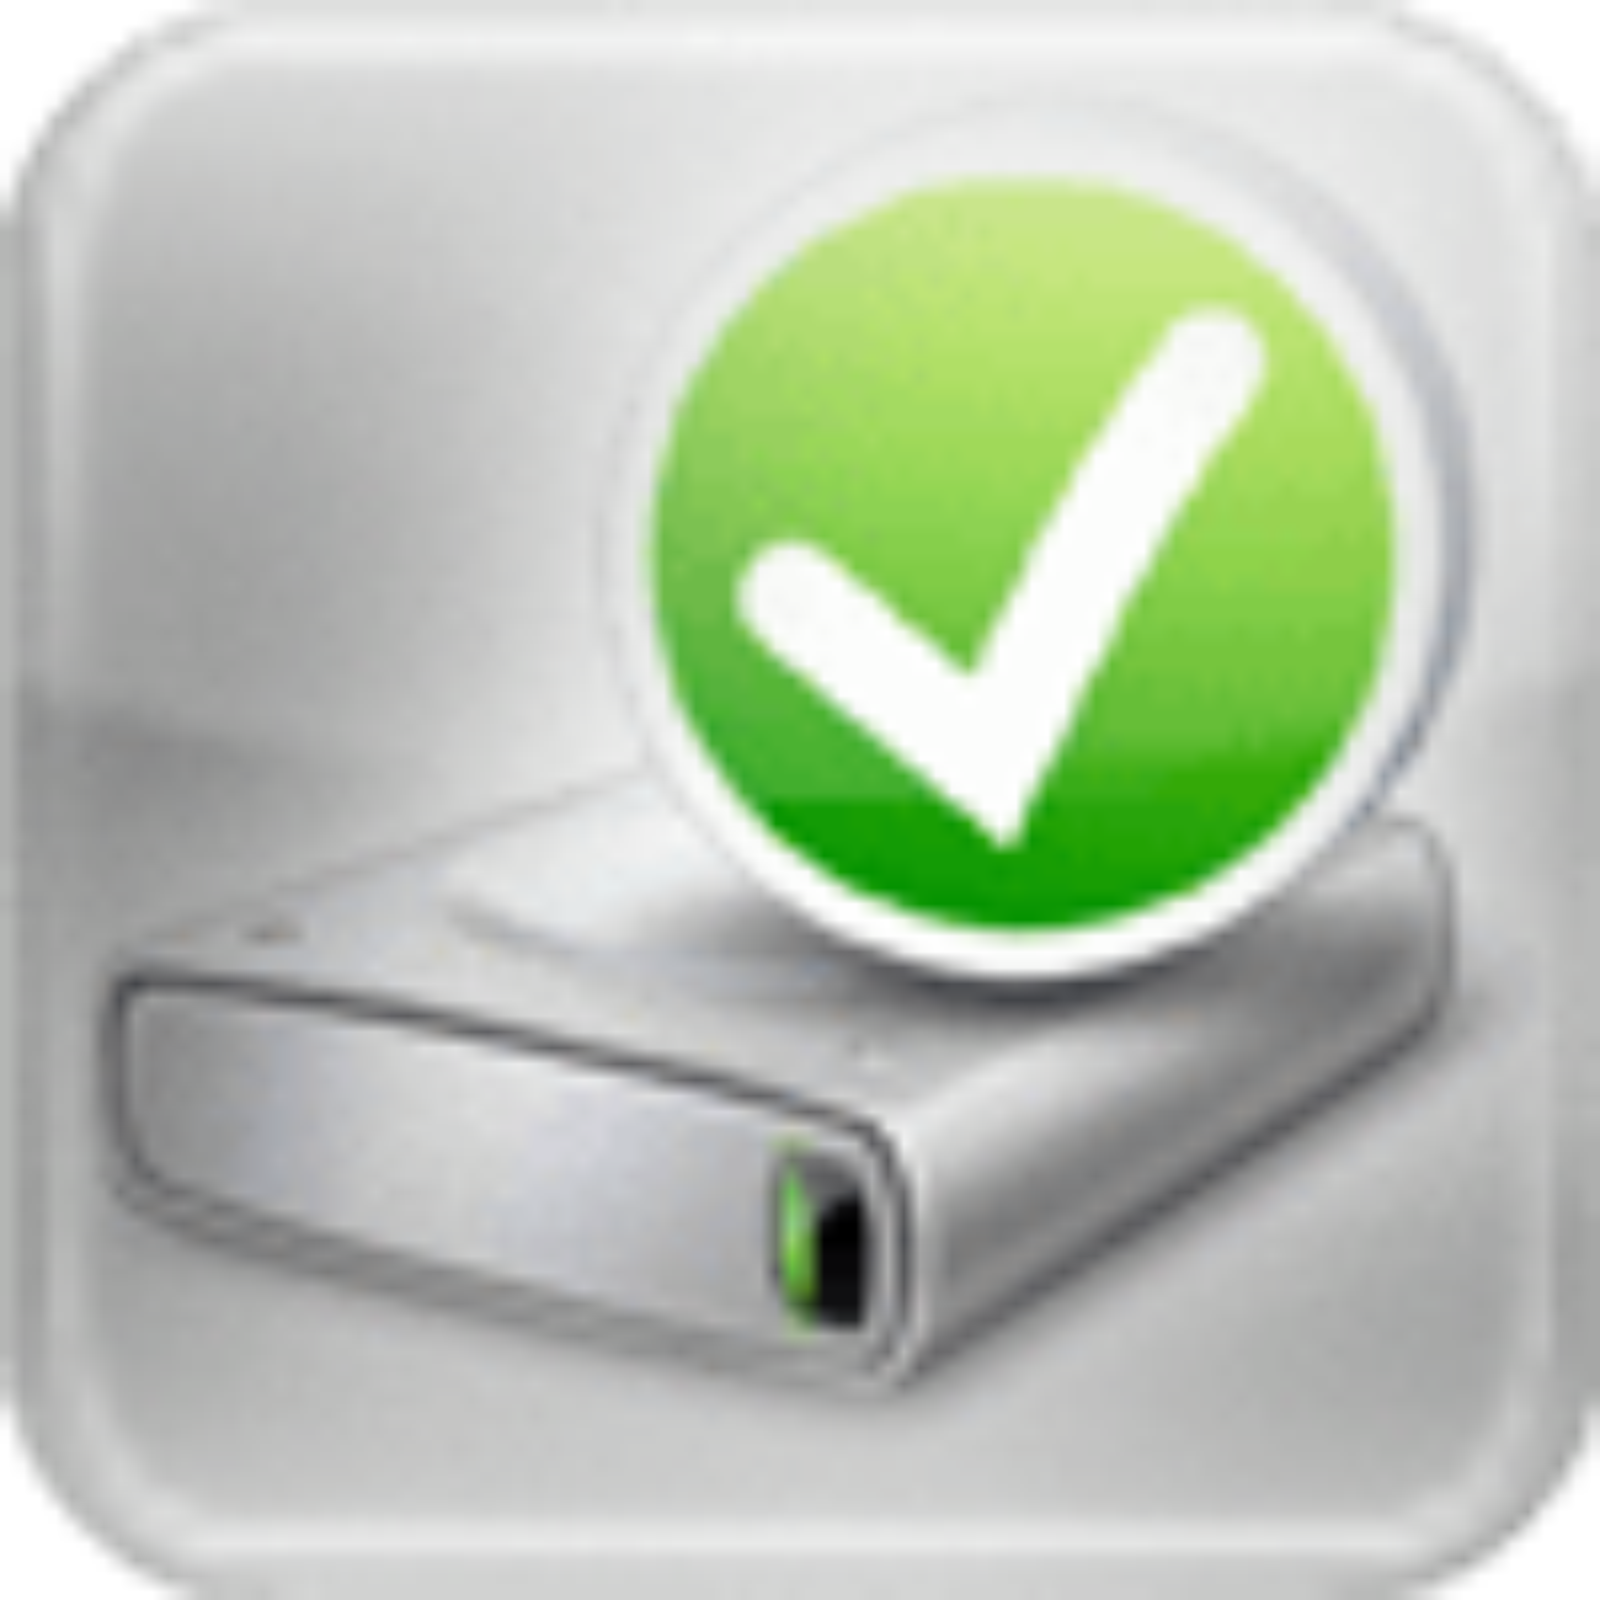 WinUtilities Free Disk Defragmenter 1.4